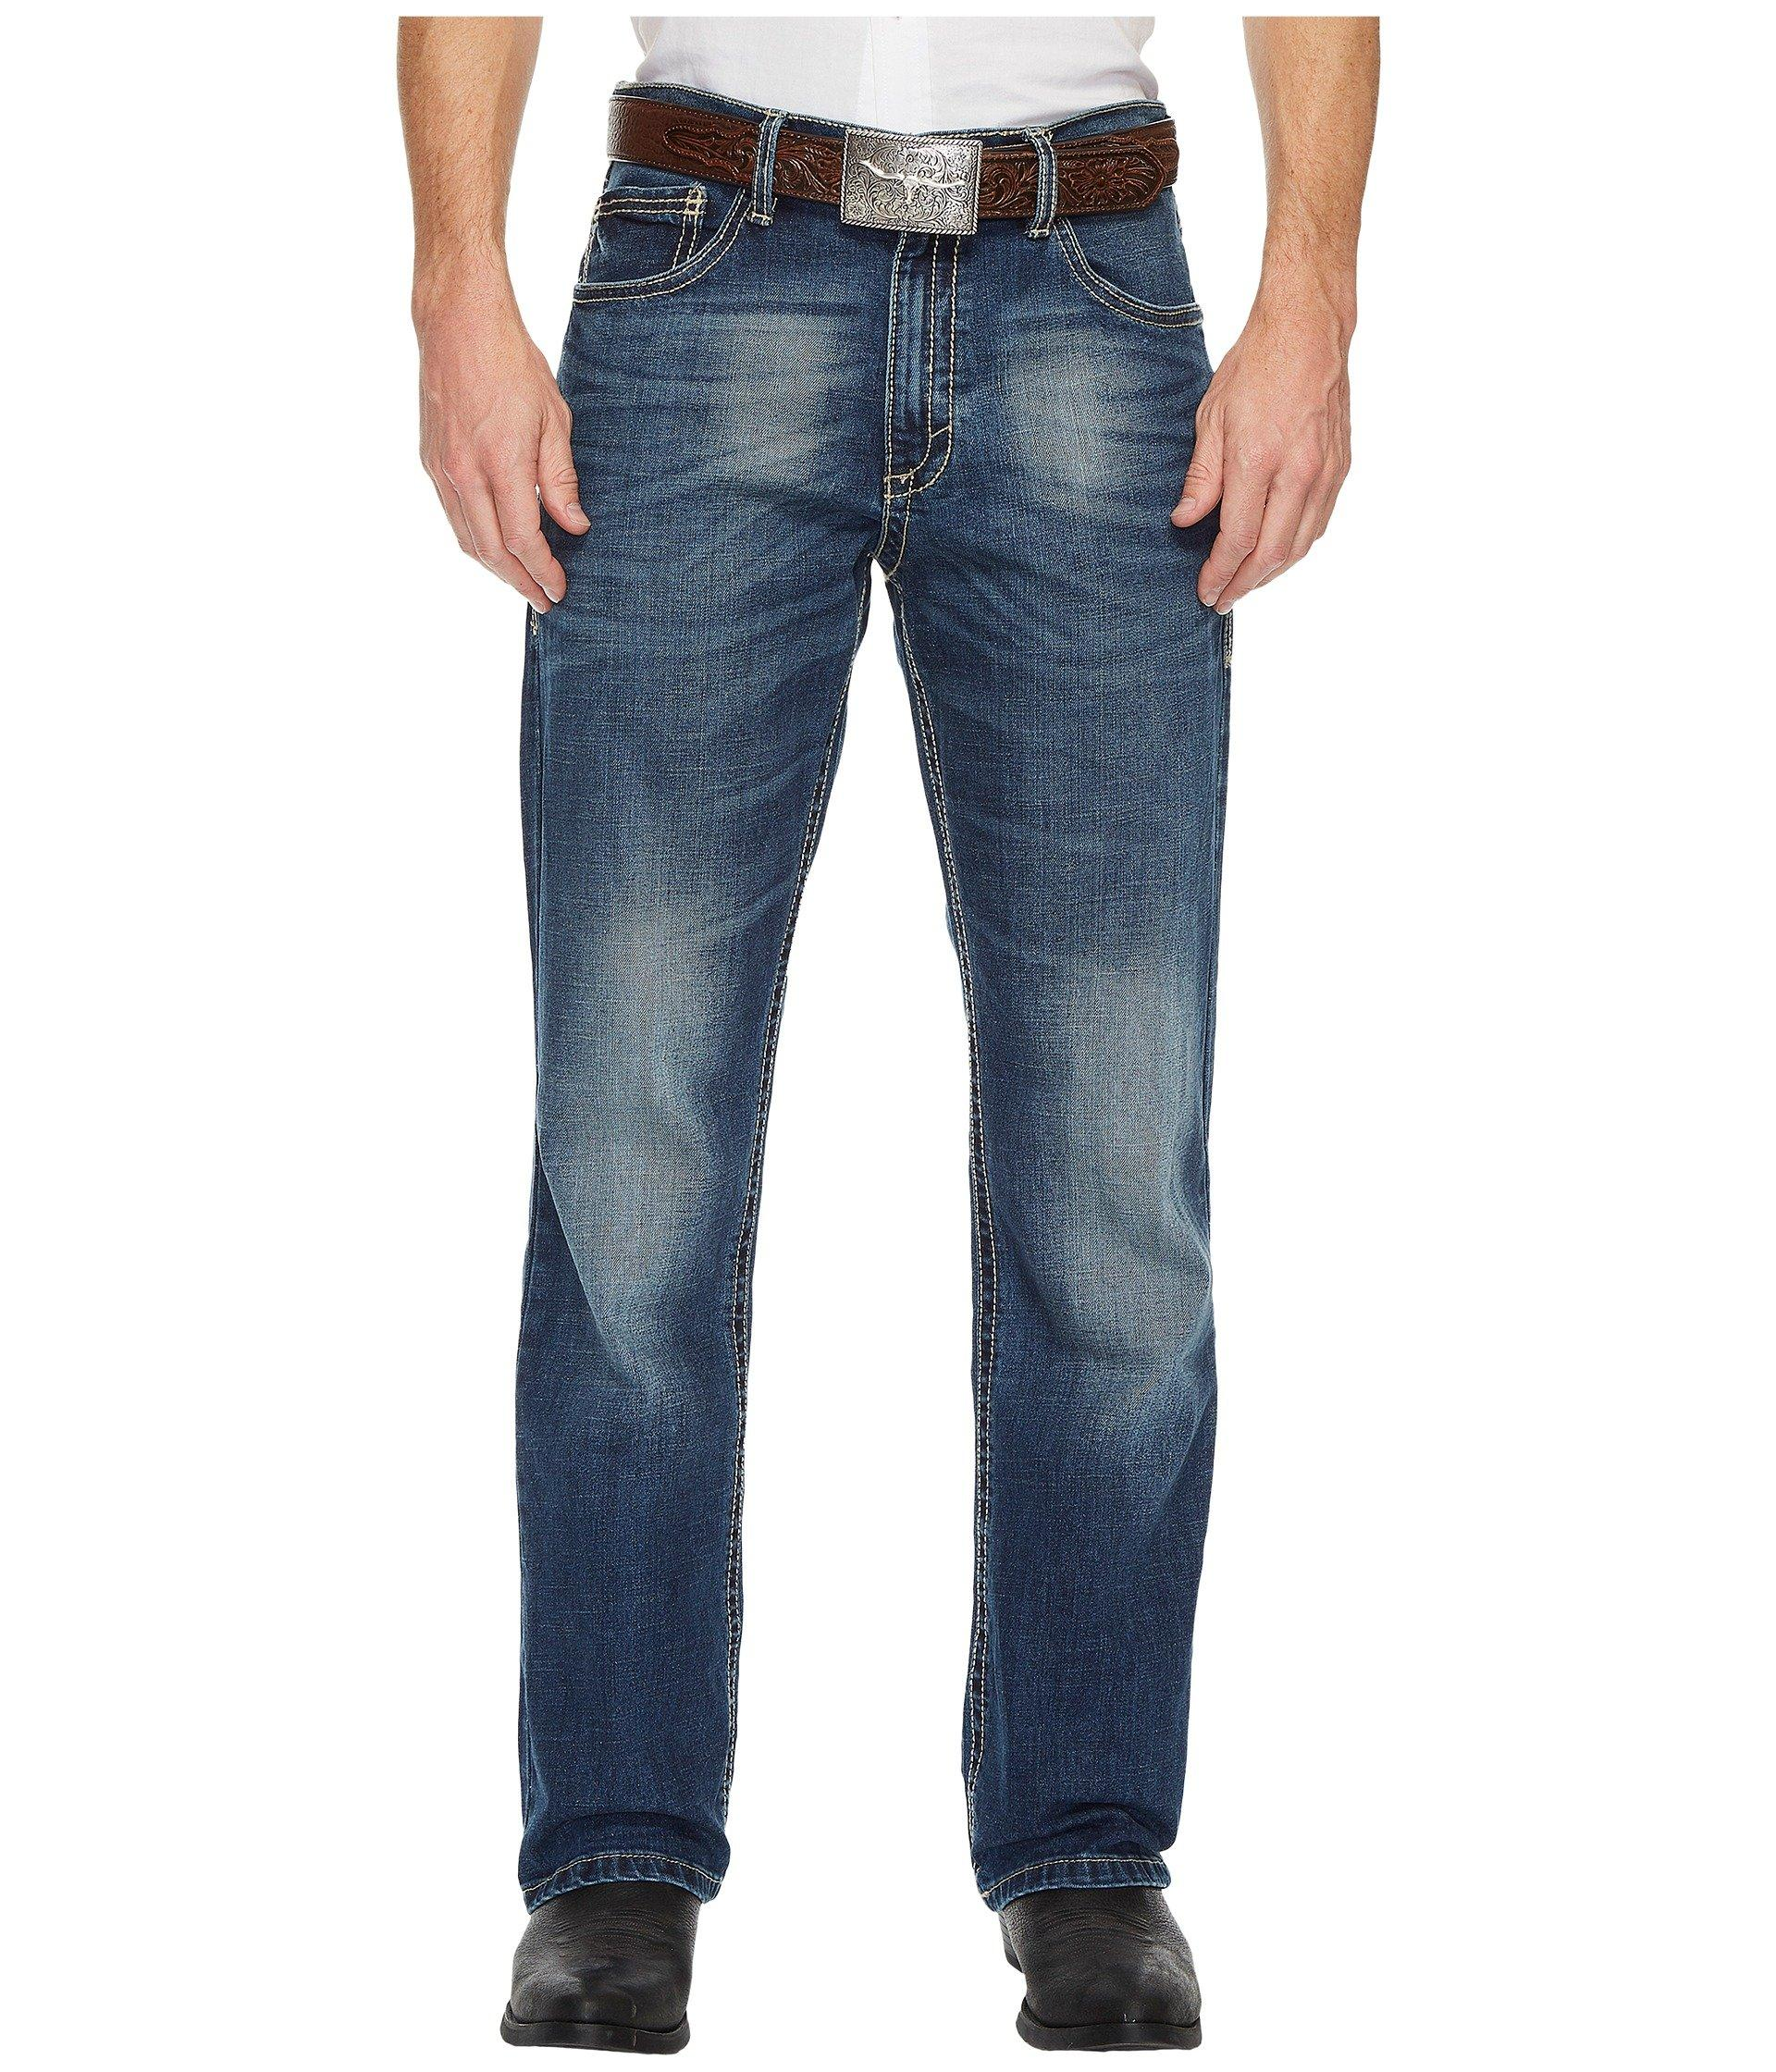 Wrangler Vintage Bootcut Slim Fit 20x Jeans In Midland